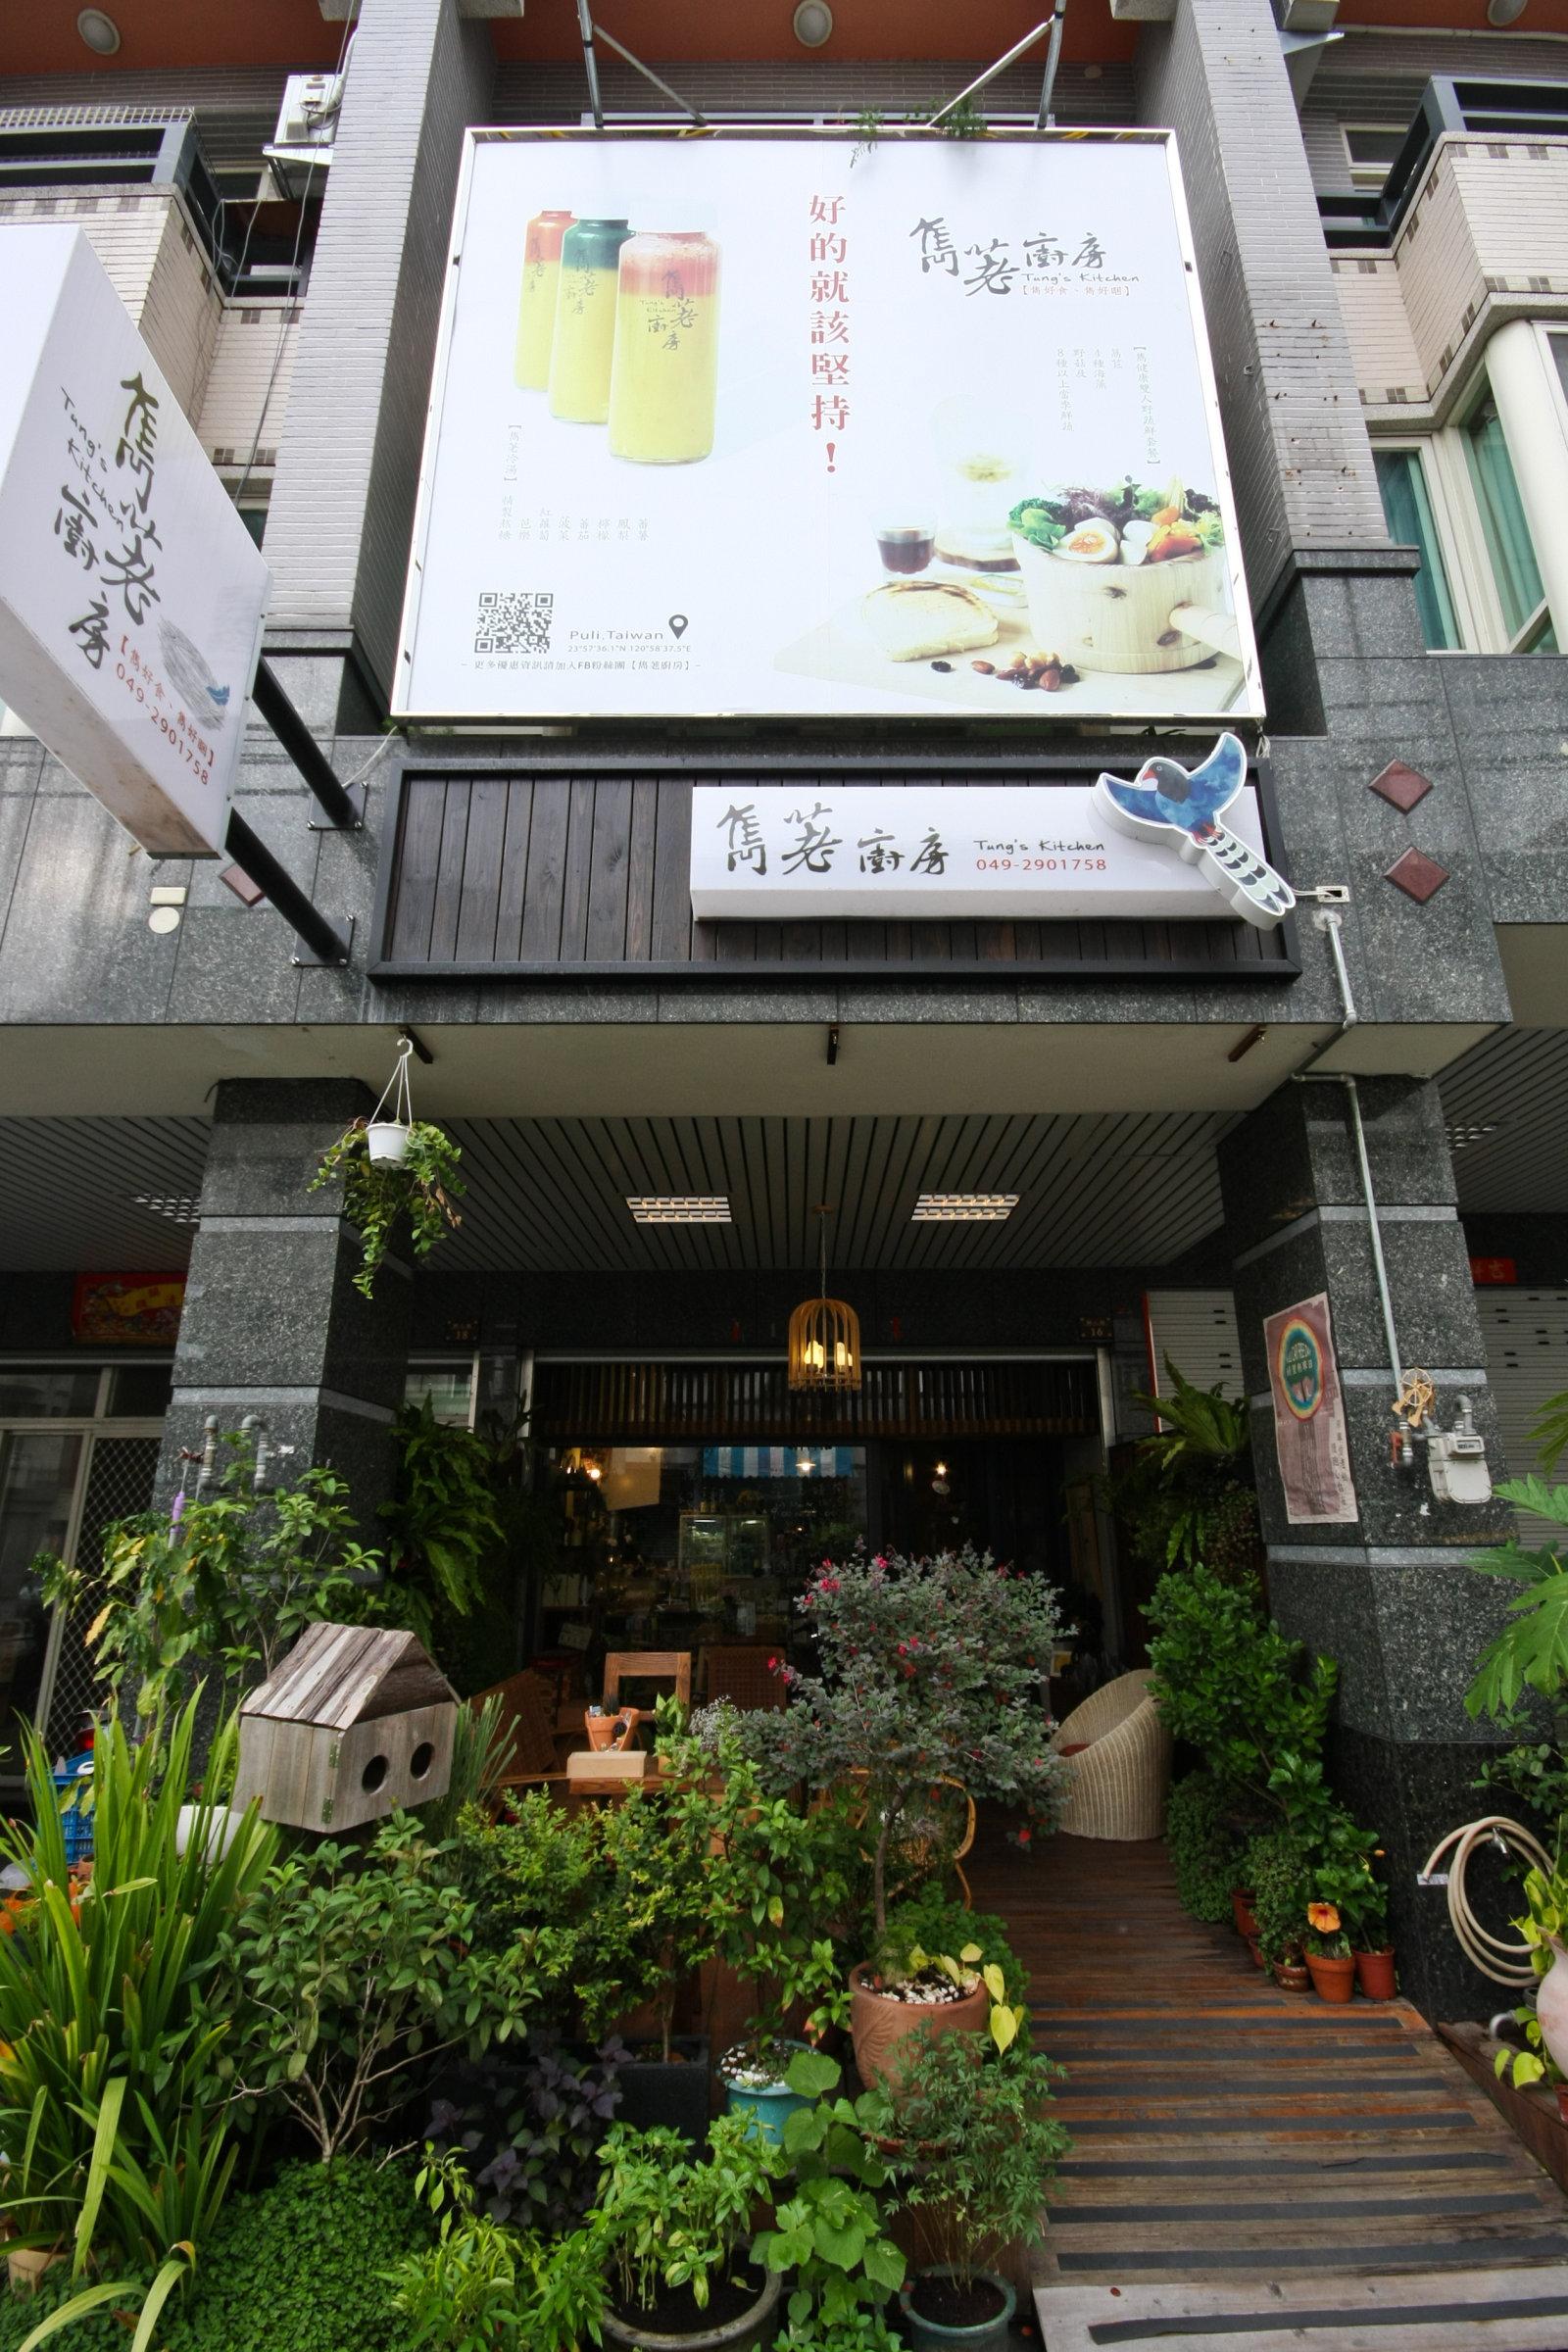 雋荖廚房 Tung's Kitchen